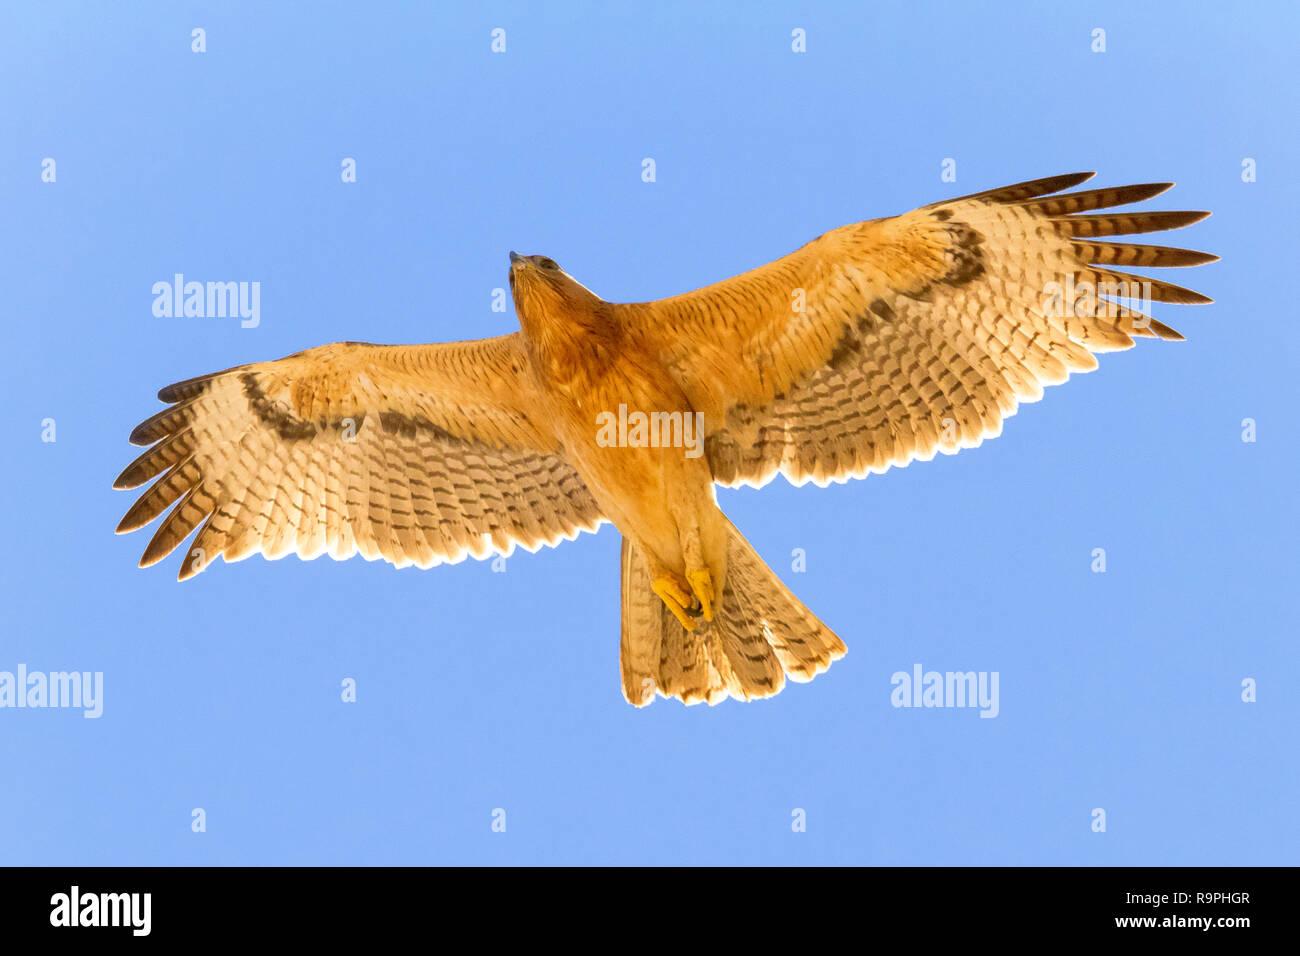 Bonelli's Eagle (Aquila fasciata), juvenile im Flug underparts angezeigt Stockbild